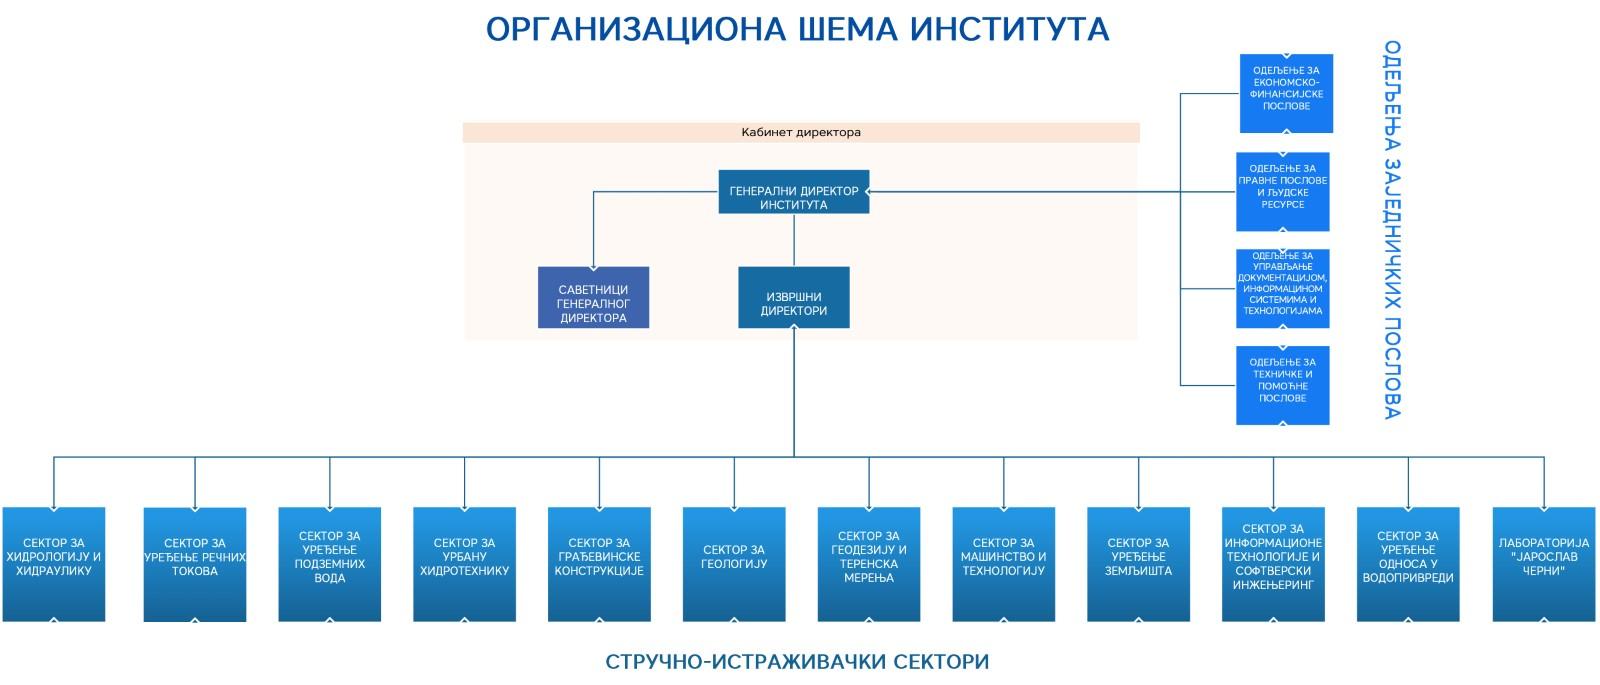 Organizaciona šema Instituta